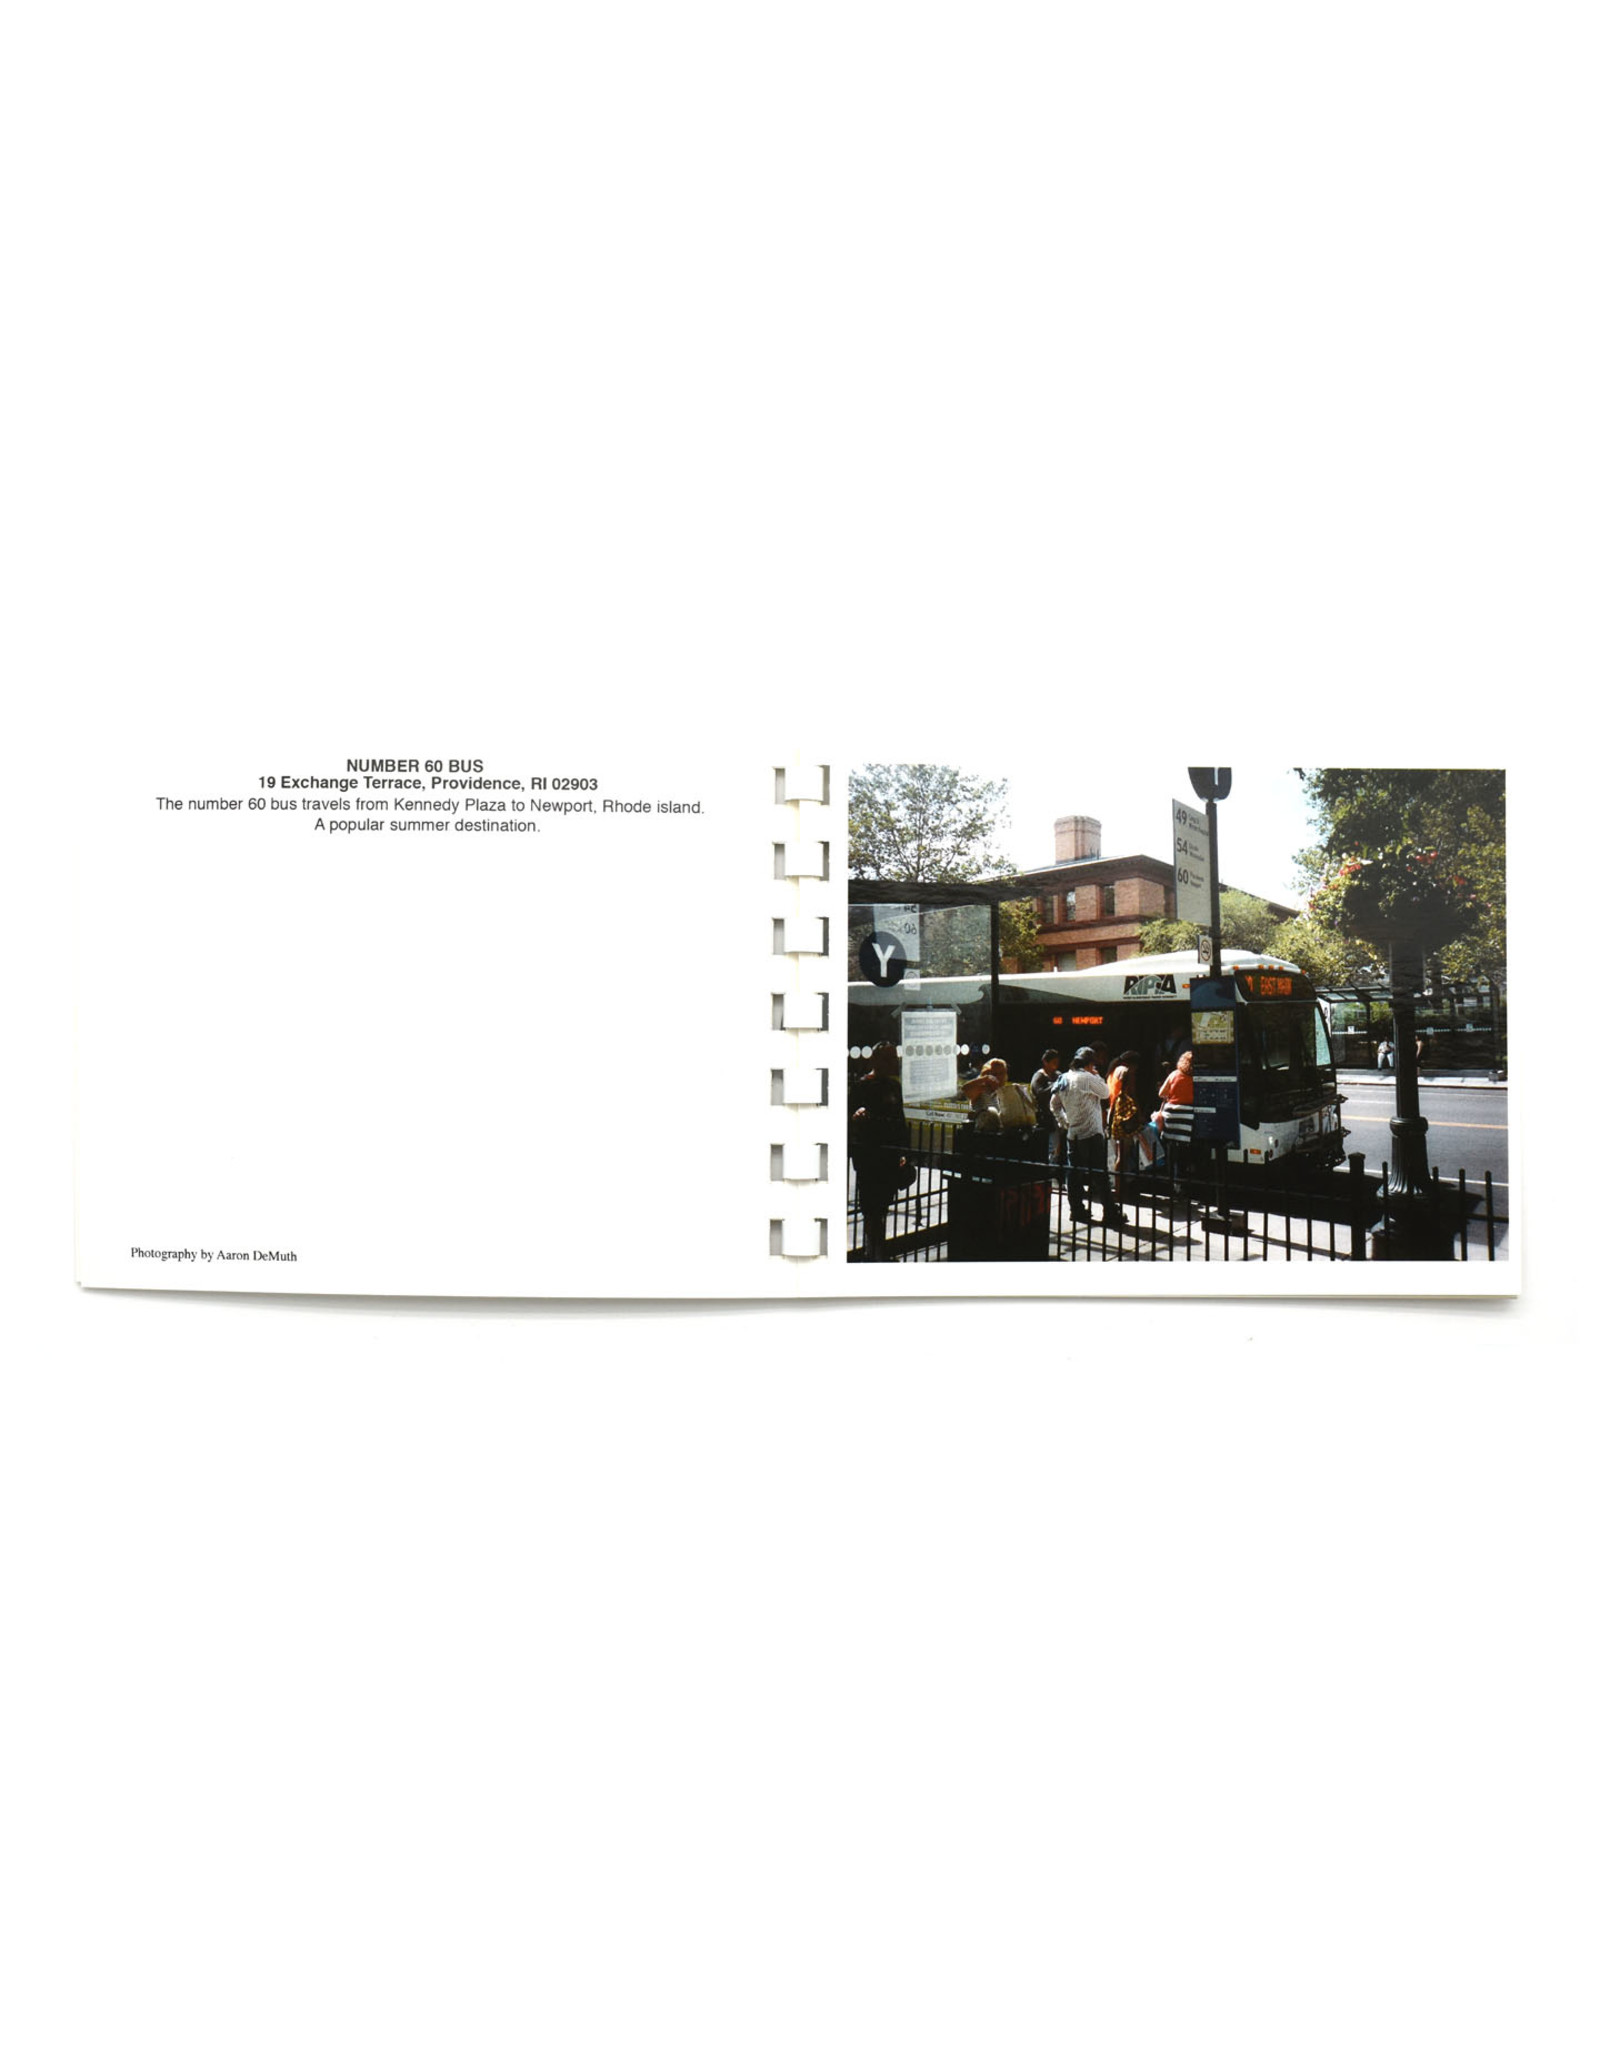 Kennedy Plaza Album Prints